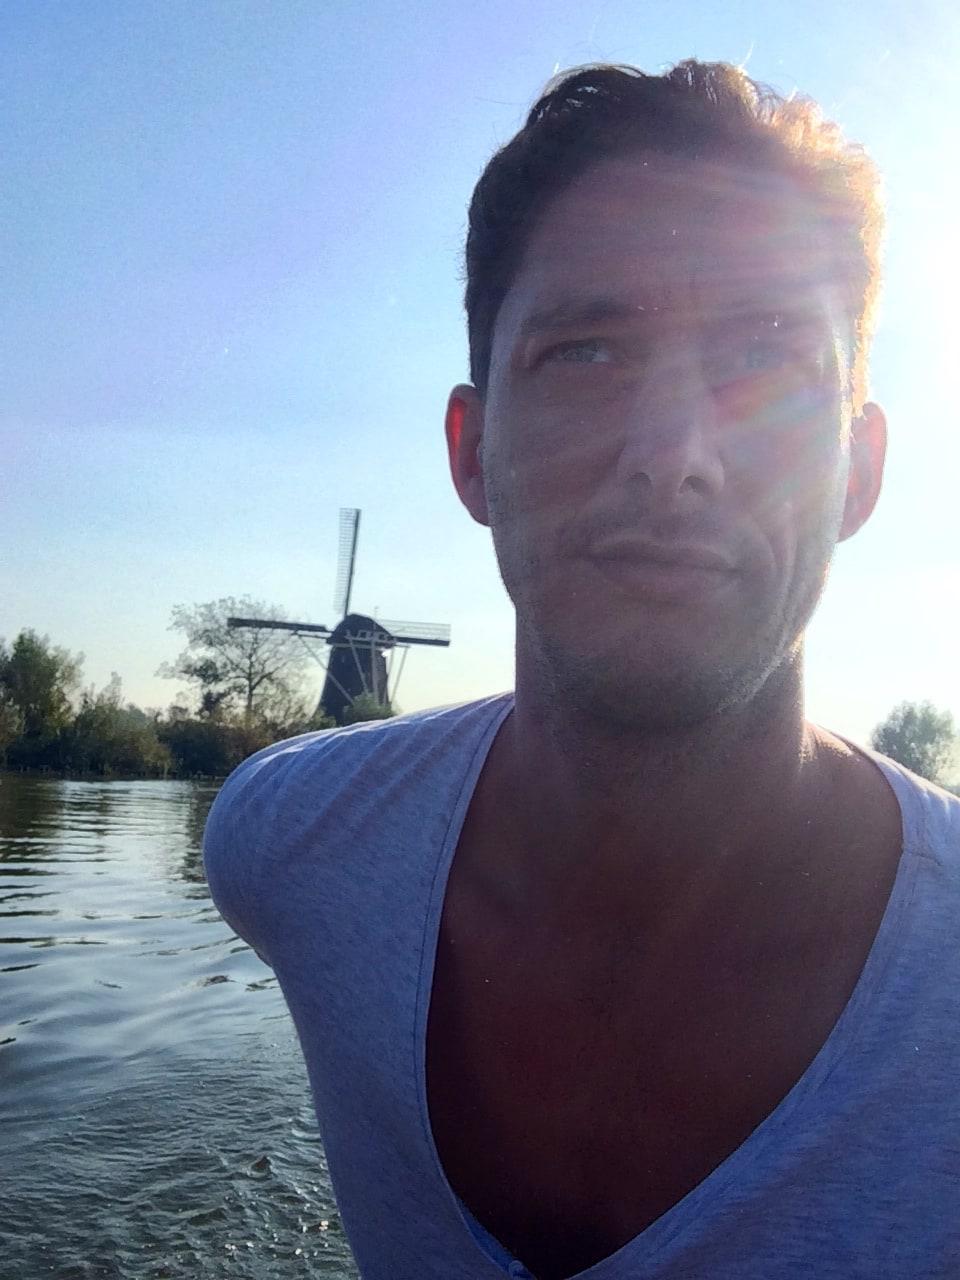 Len from Amsterdam